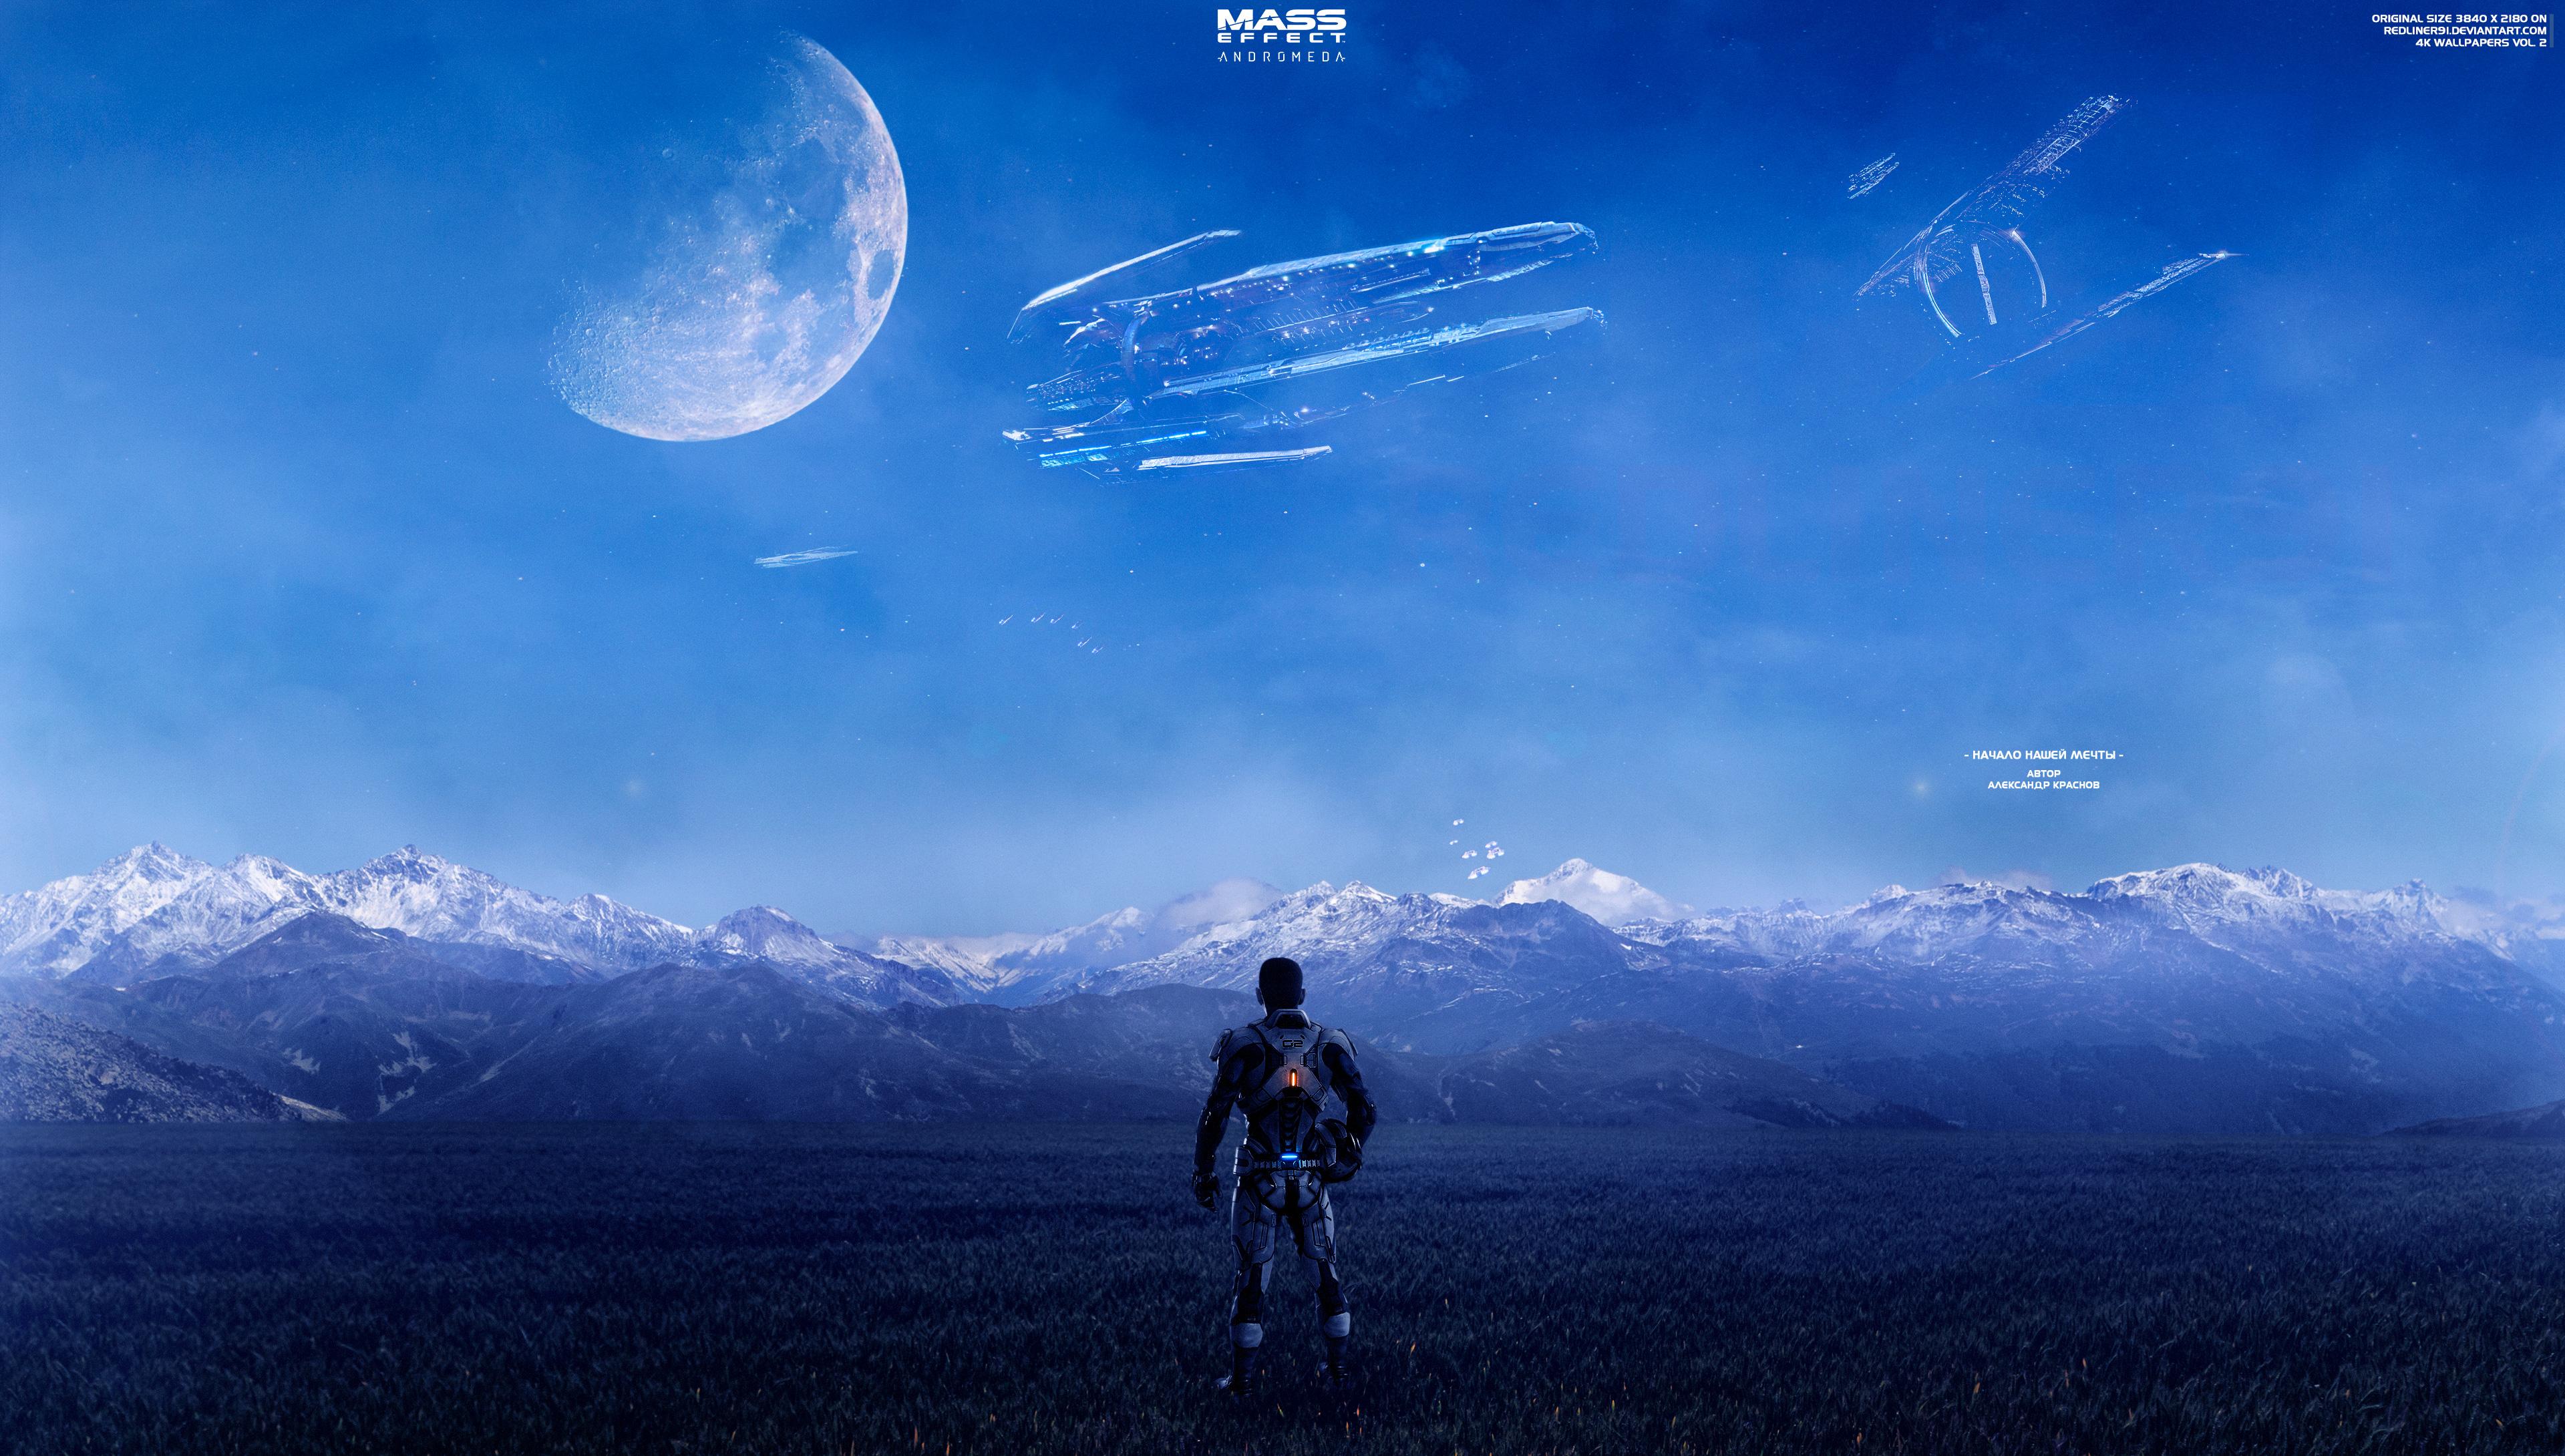 Mass Effect Andromeda Wallpapers: Mass Effect Andromeda Game Artwork, HD Games, 4k